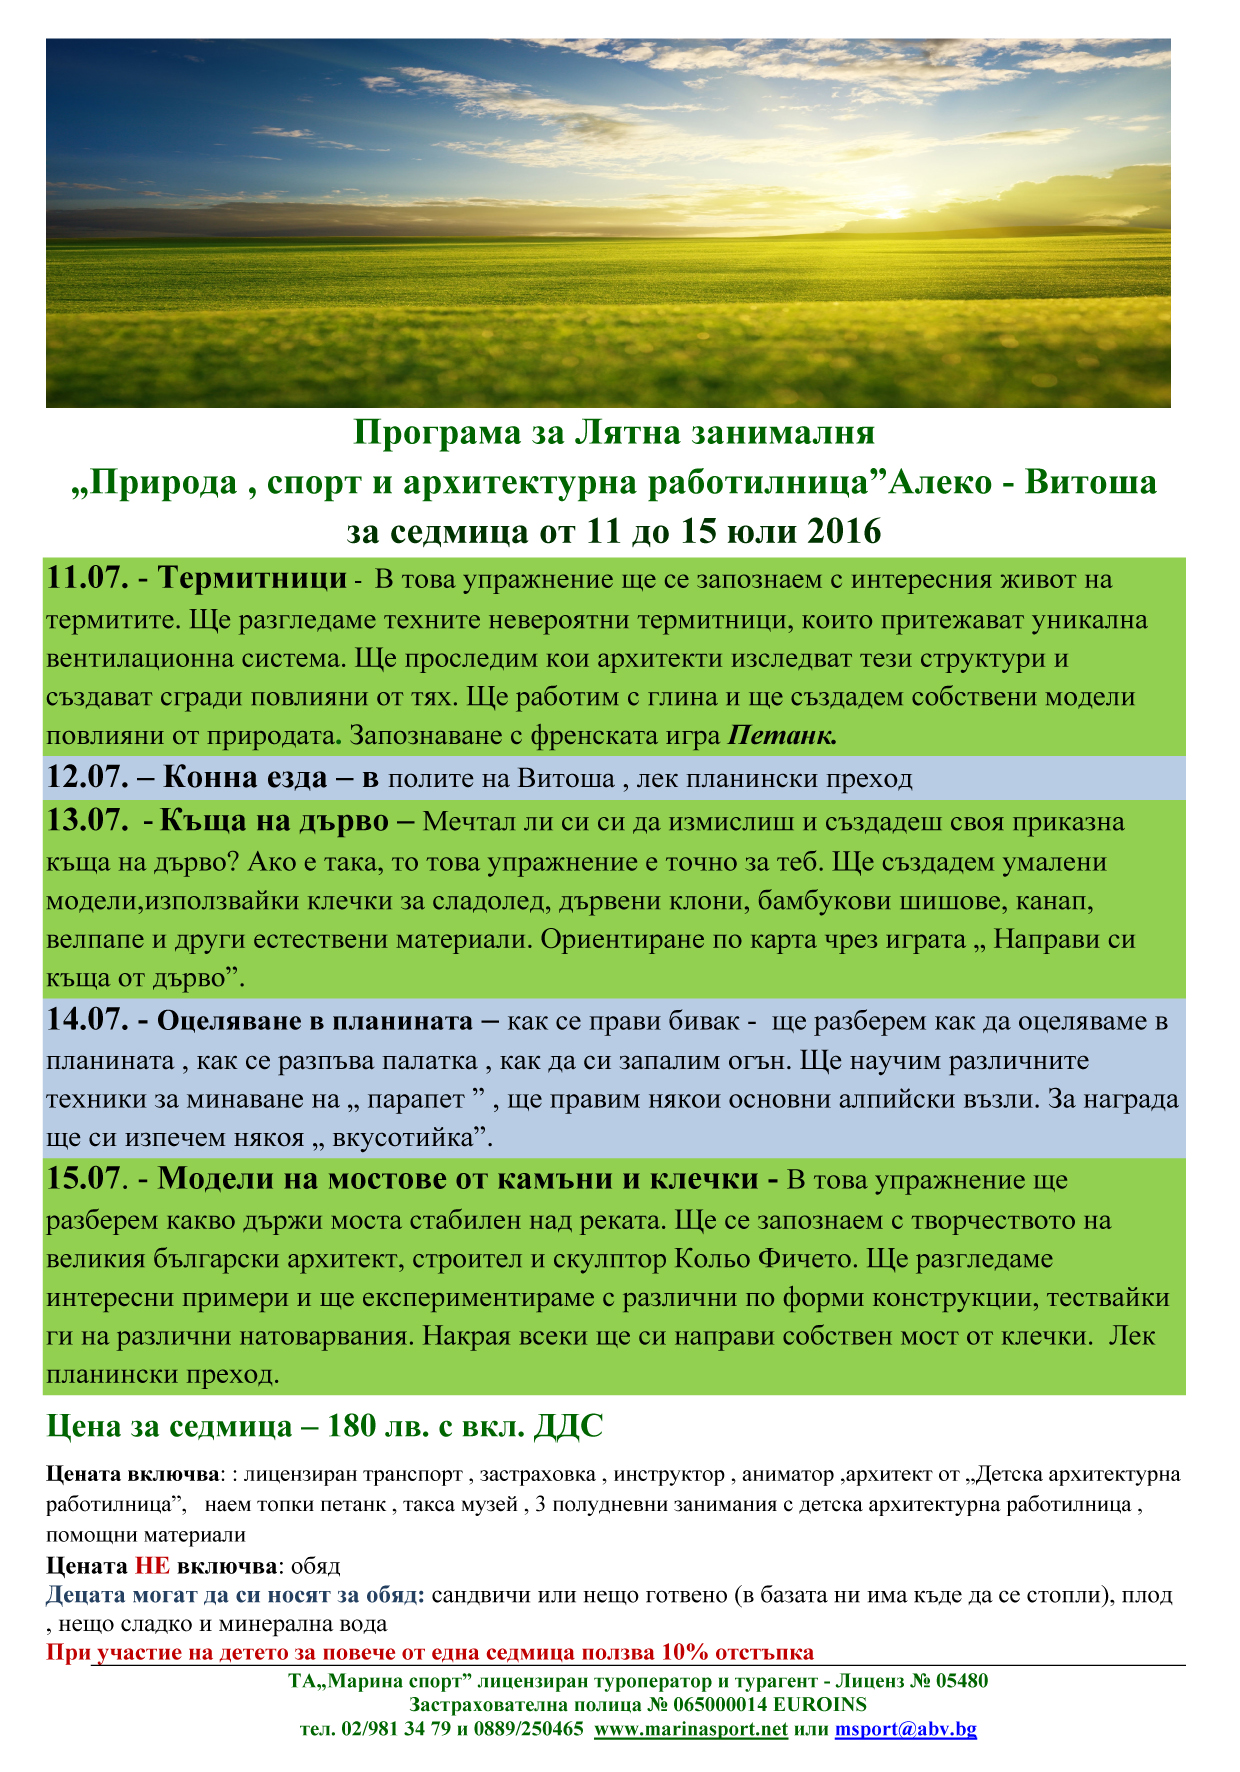 """Природа , спорт и архитектурна работилница"", Алеко, Витоша - 11 до 15 юли 2016г."